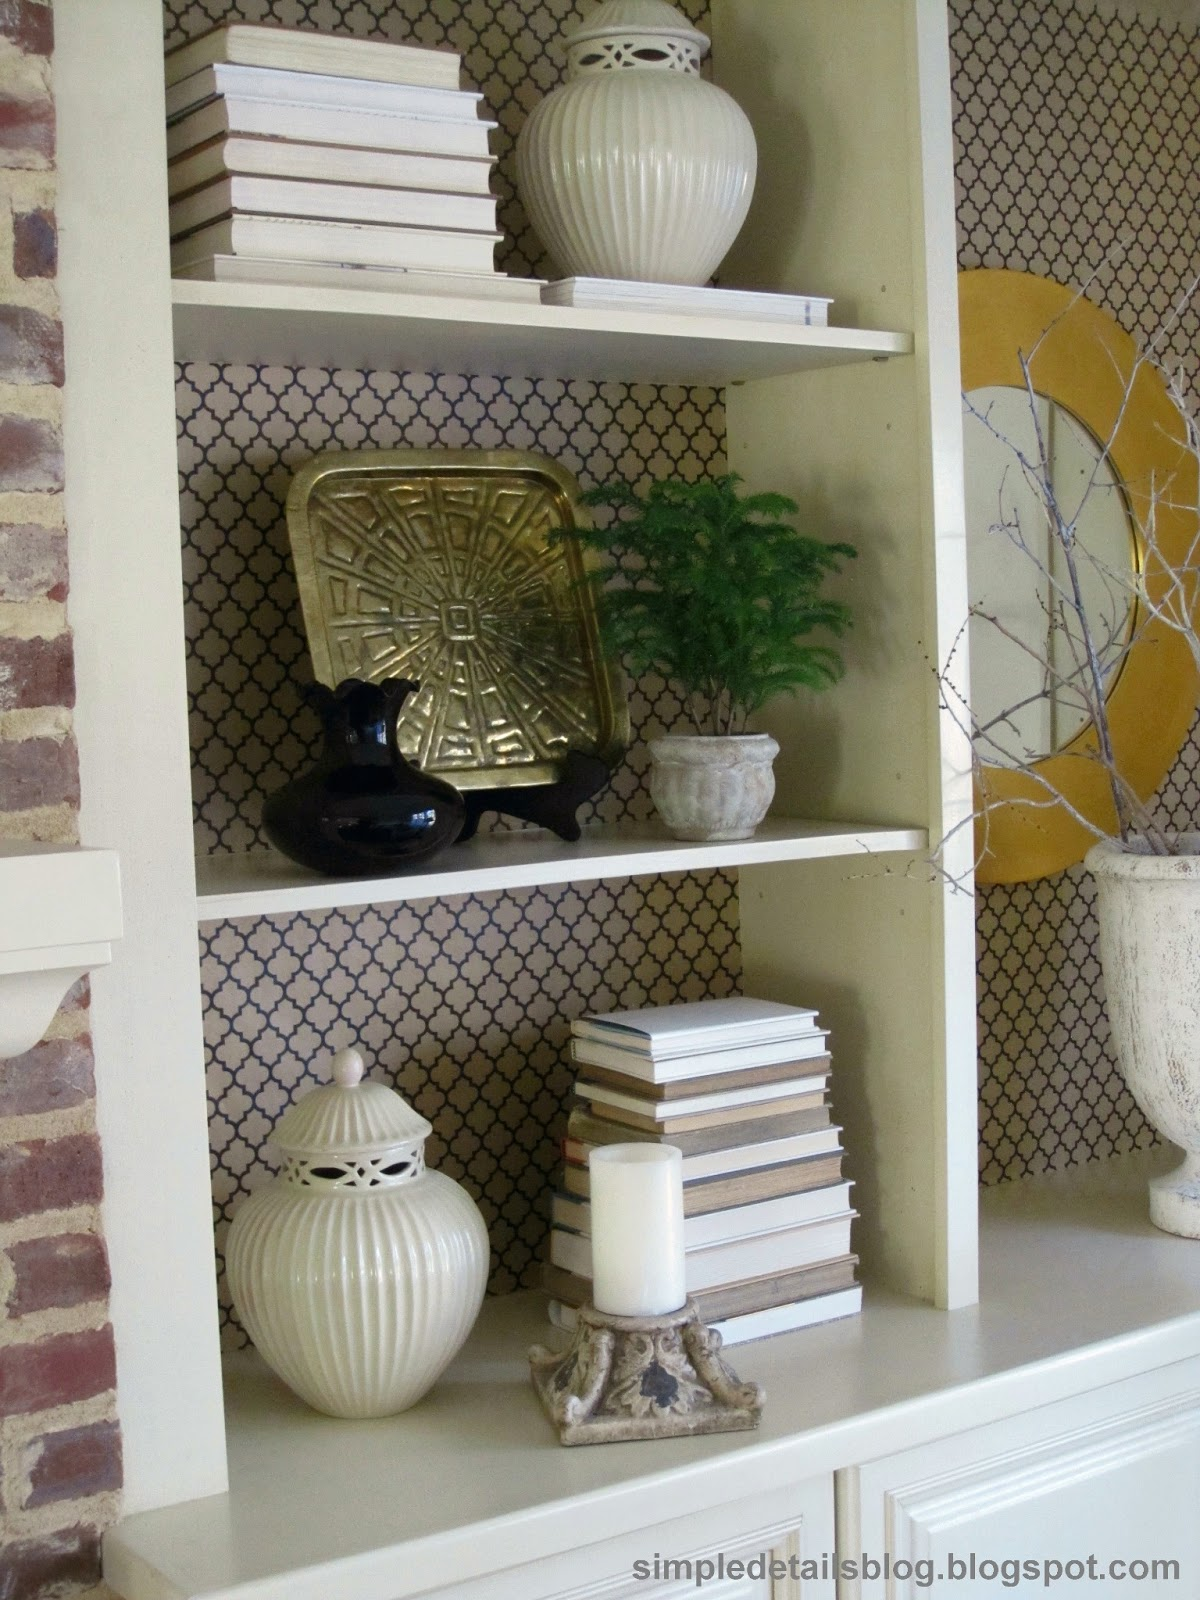 Simple Details: $6 diy bookcase makeover